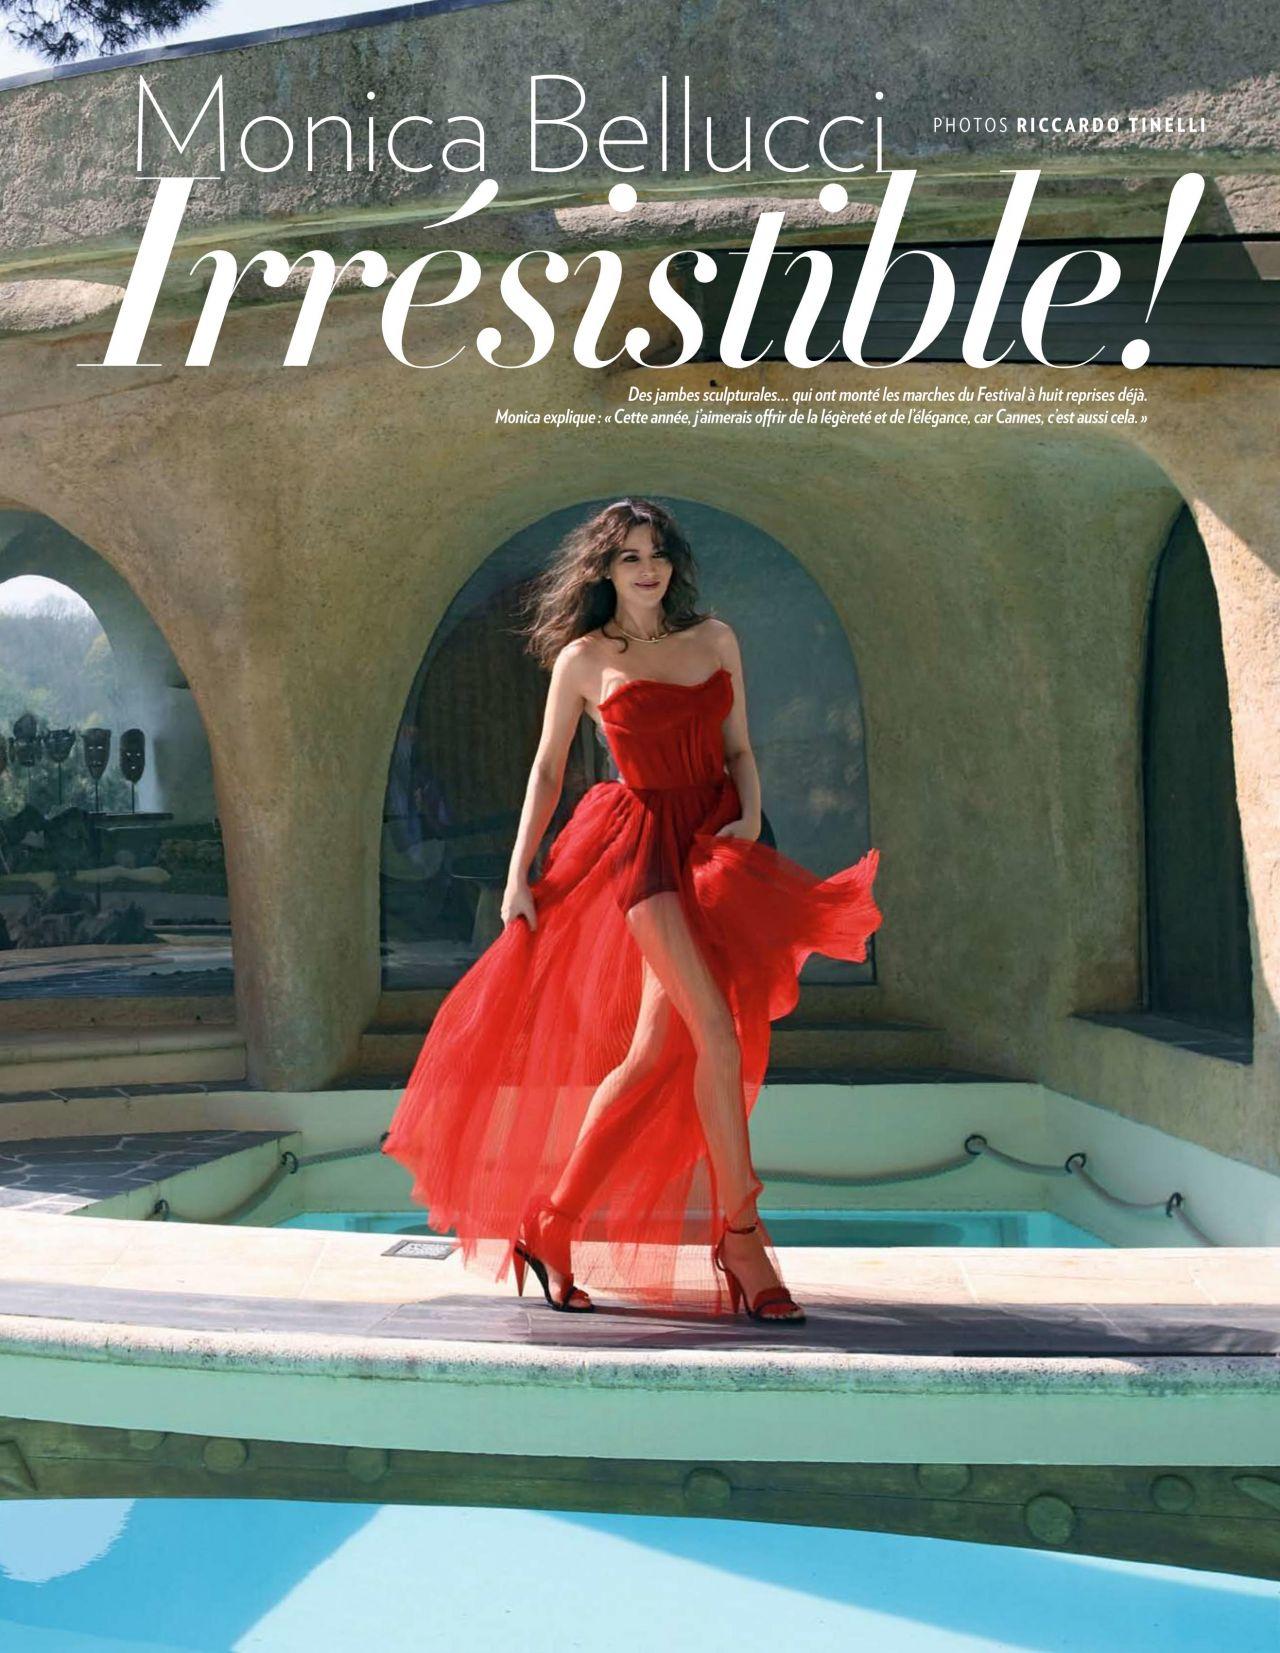 Monica bellucci paris match magazine may 2019 issue - 2019 year